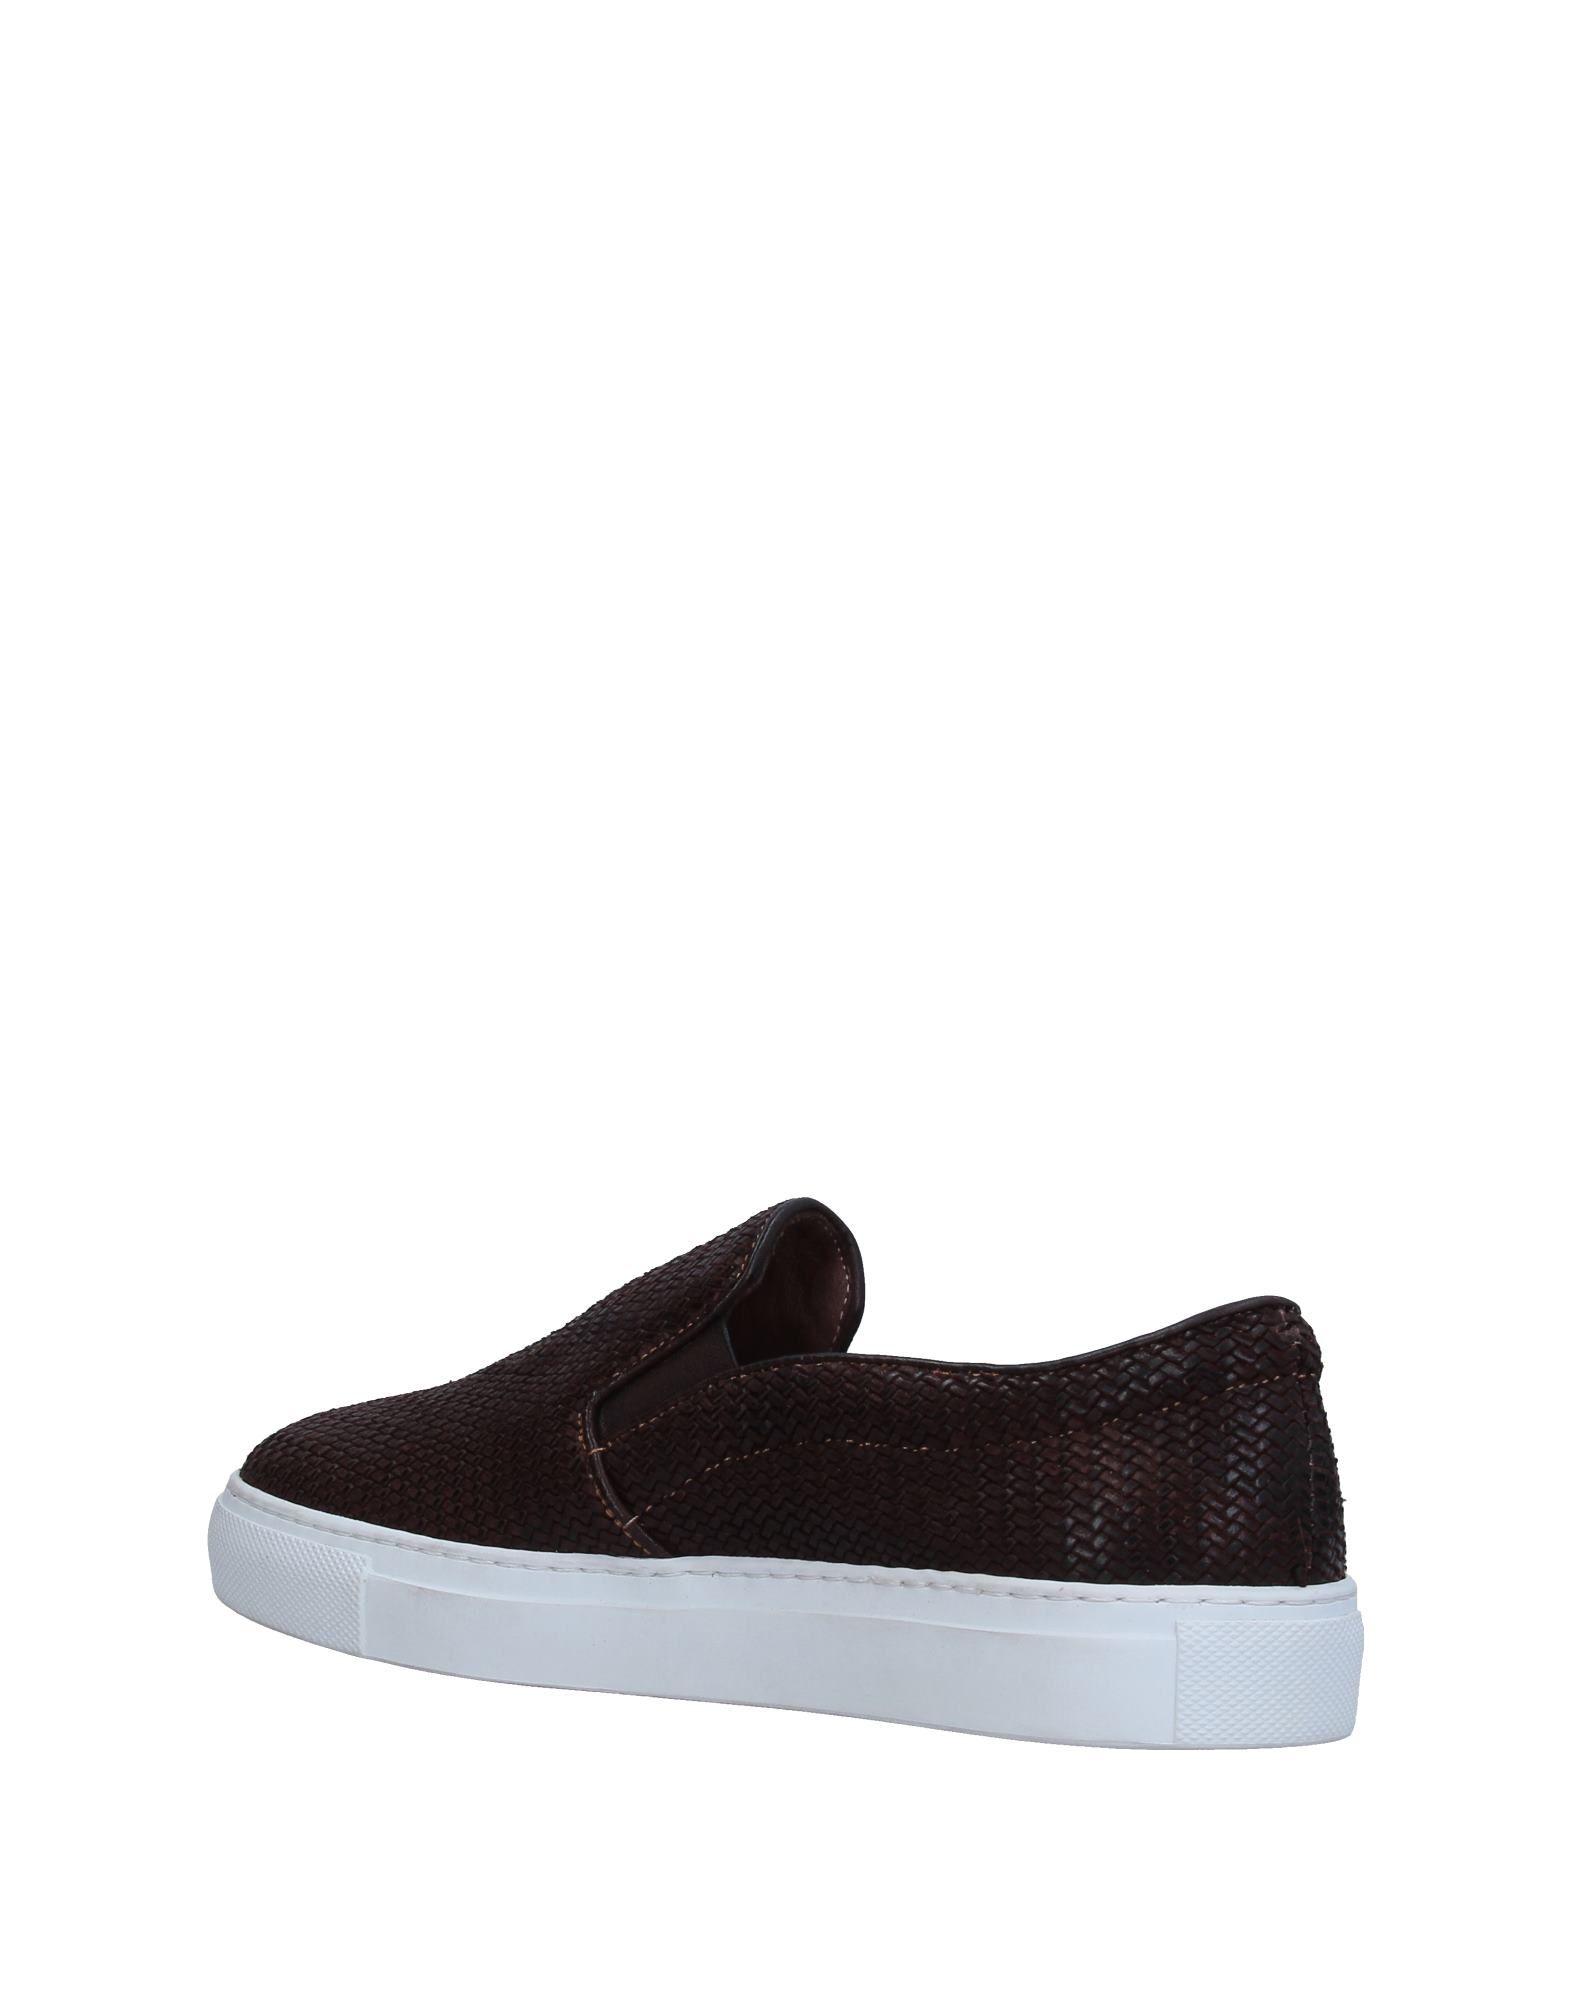 Pantofola Schuhe D'oro Sneakers Damen  11339679PX Neue Schuhe Pantofola 6d22cf